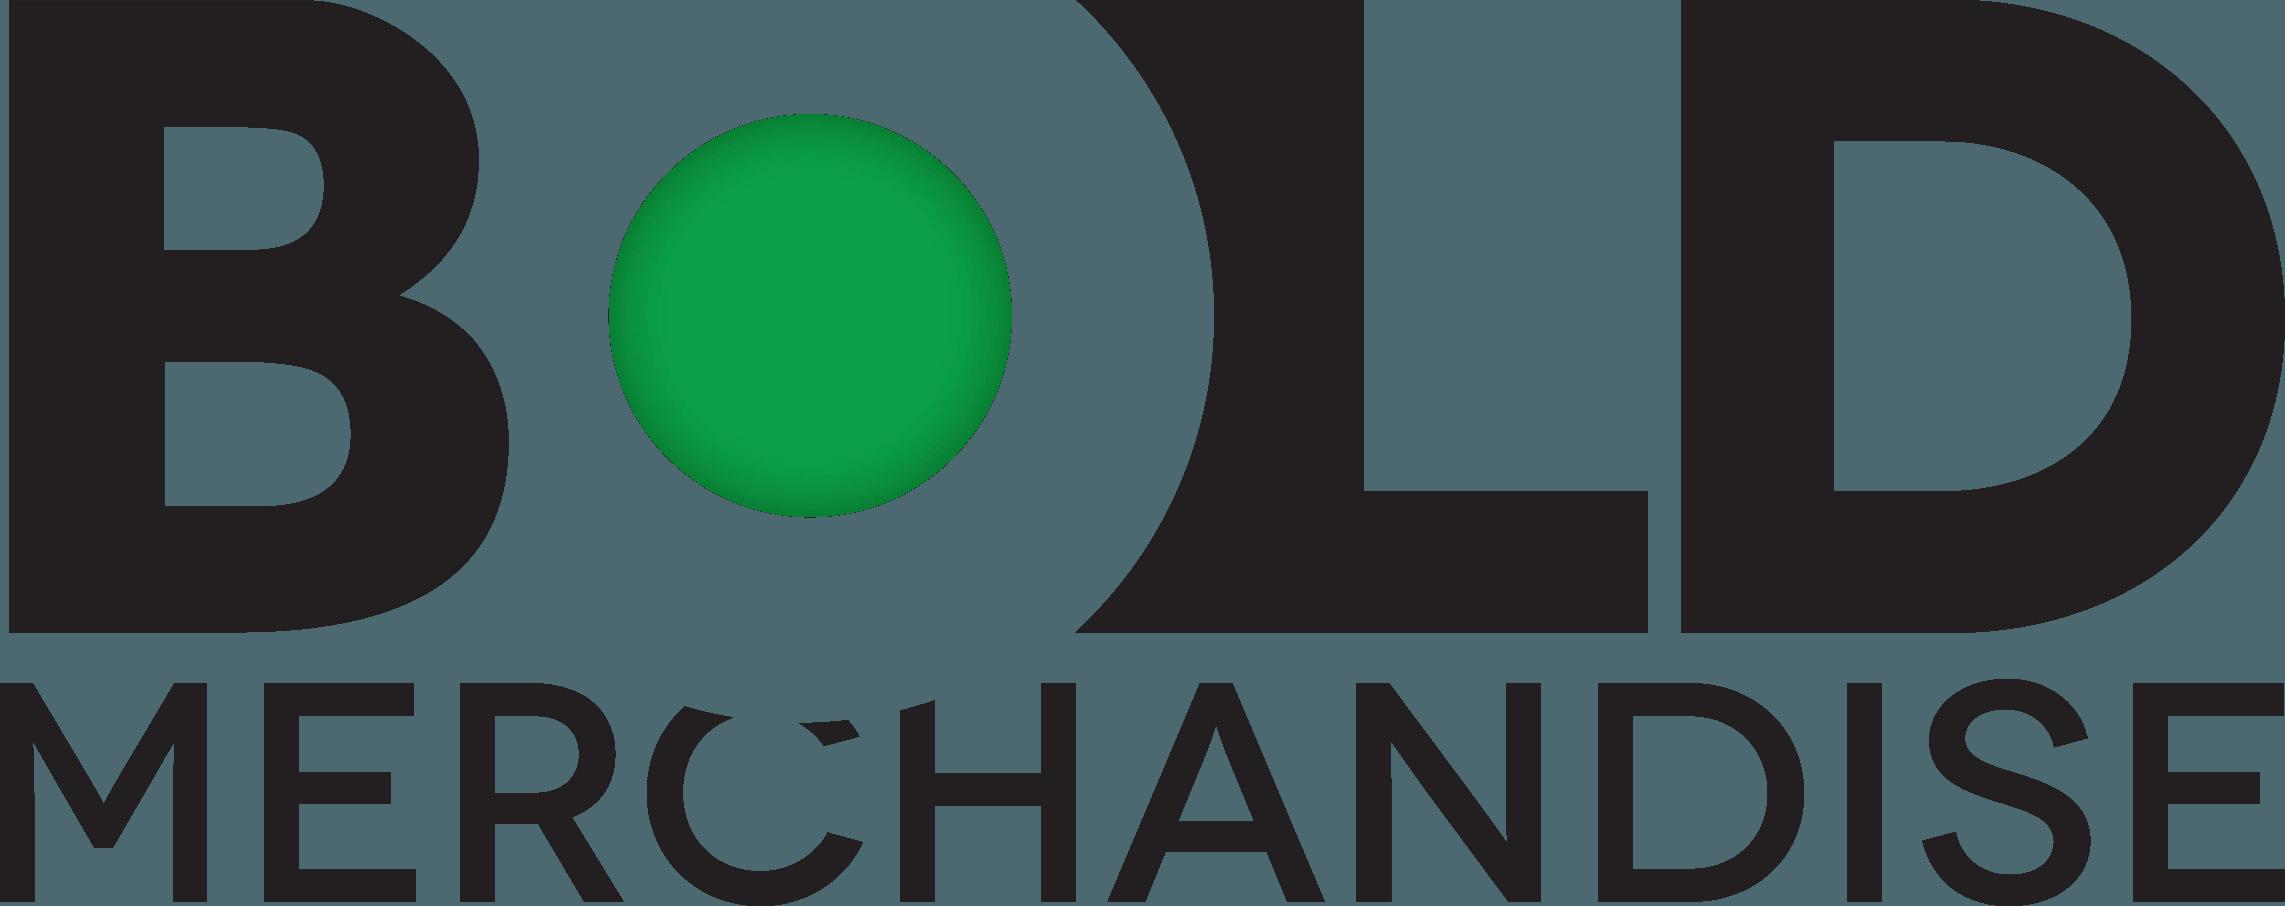 Bold Merchendise Logo